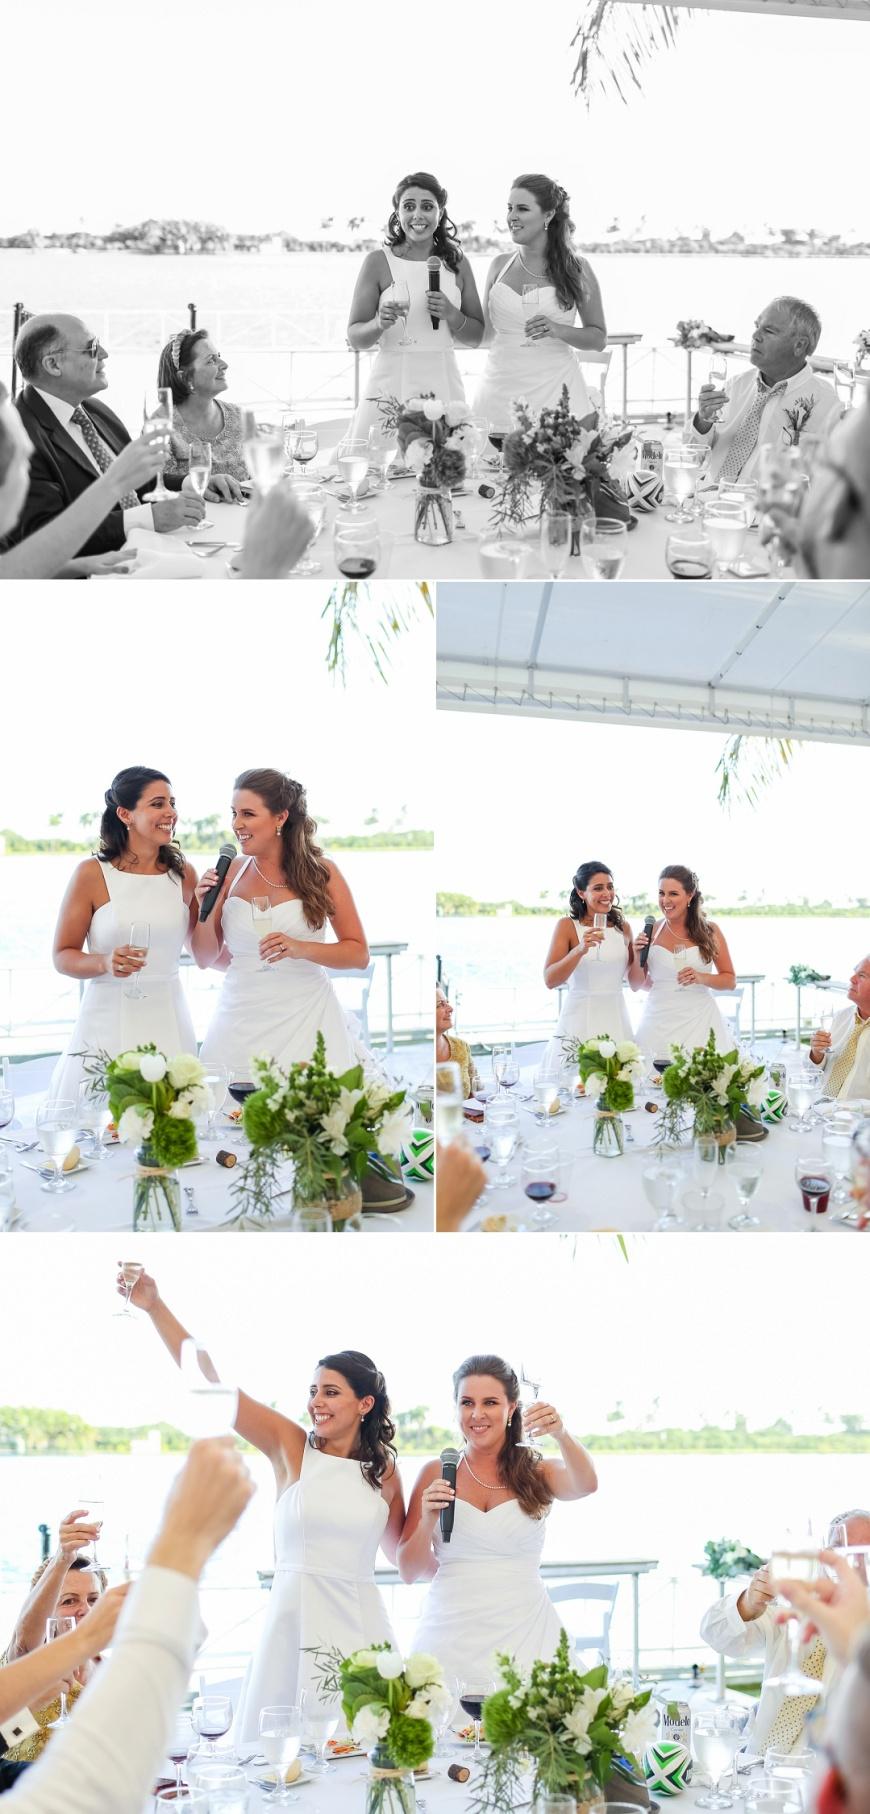 Royal-Palm-Island-Miami-Wedding-Photographer_1062.jpg